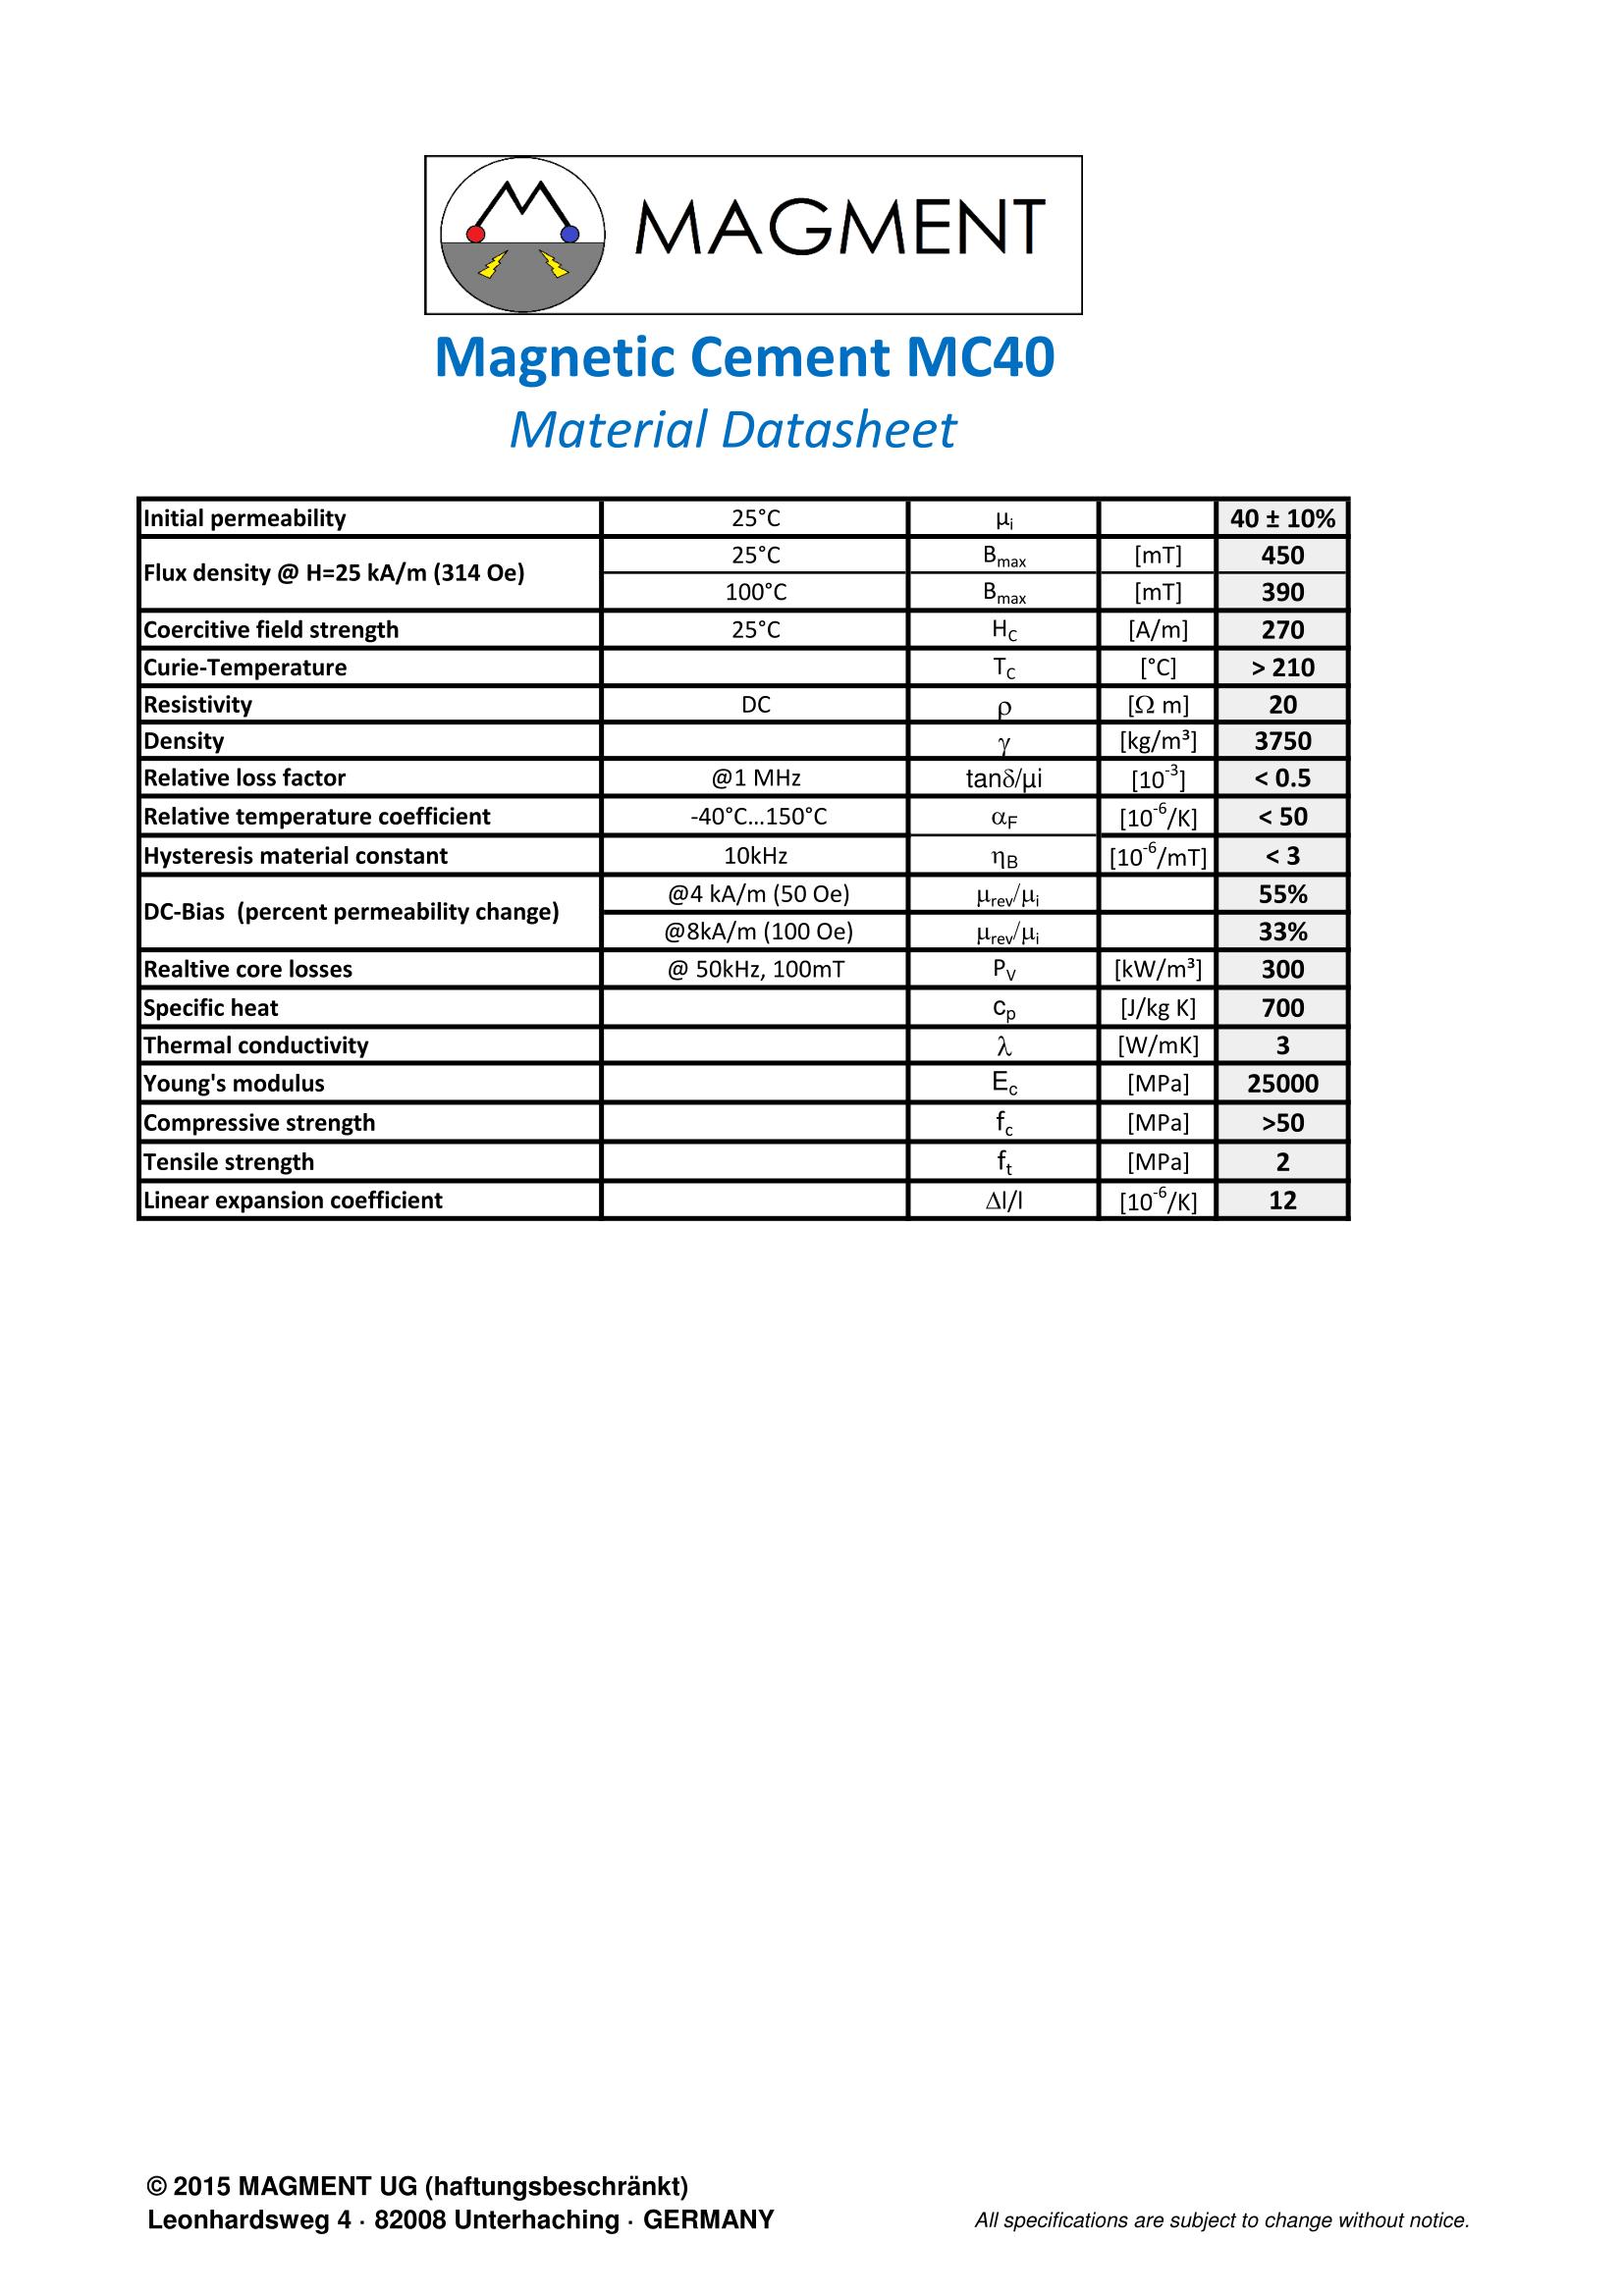 Datasheet_MAGMENT_MC40-1.png